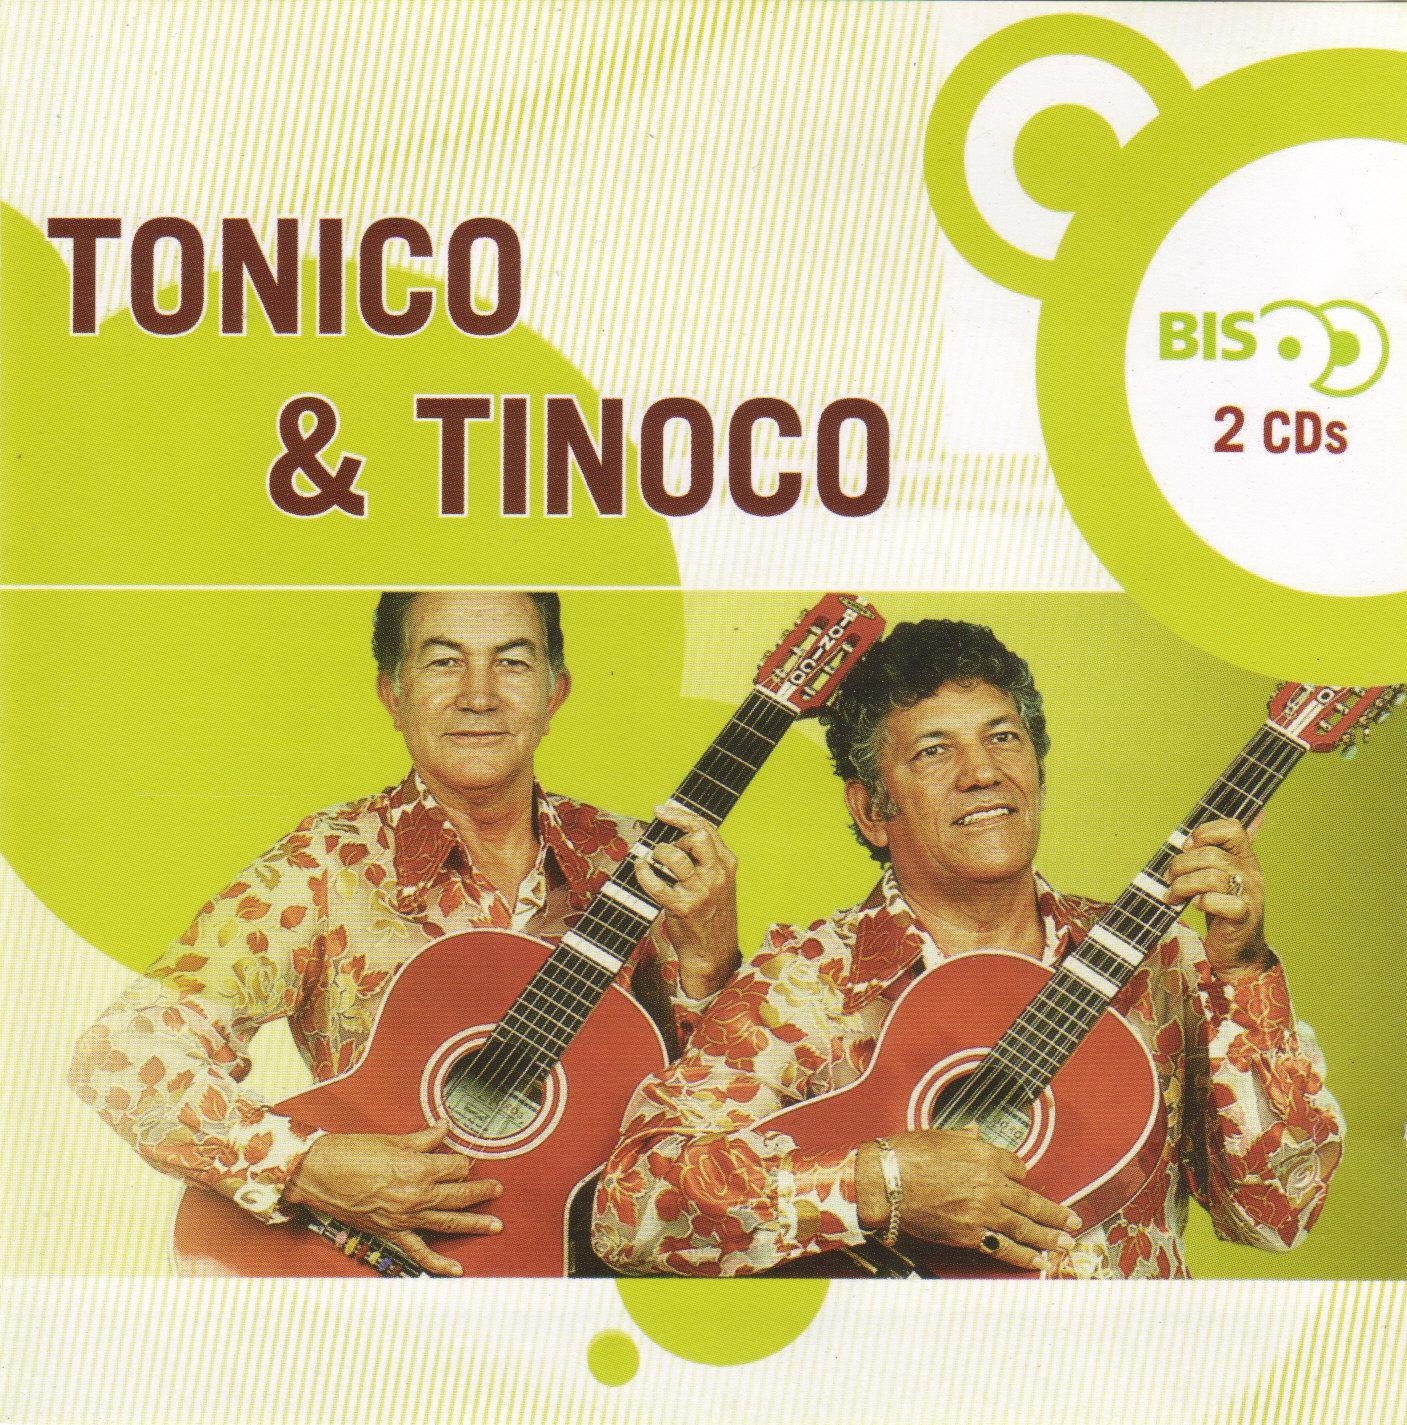 DE E COMPLETO TINOCO BAIXAR CD TONICO